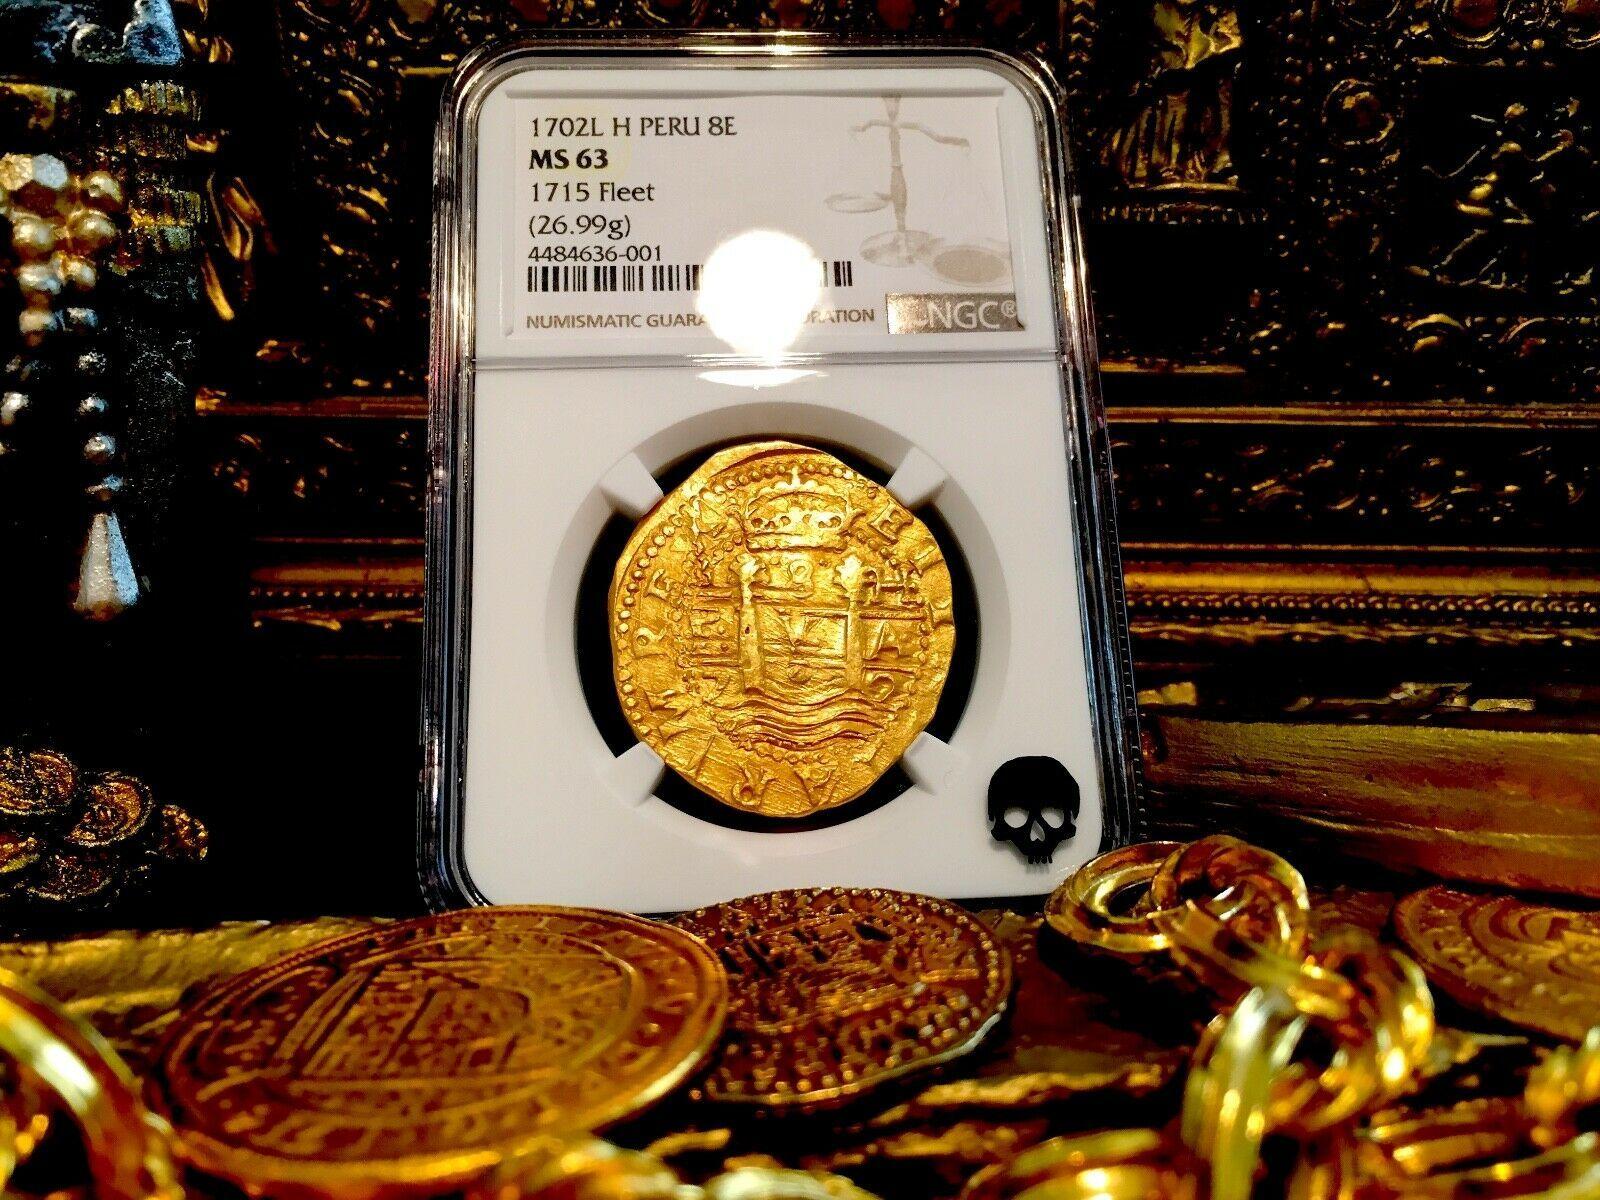 "PERU 8 ESCUDOS 1702 ""1715 FLEET SHIPWRECK"" NGC 63 PIRATE GOLD COINS TREASURE COB"